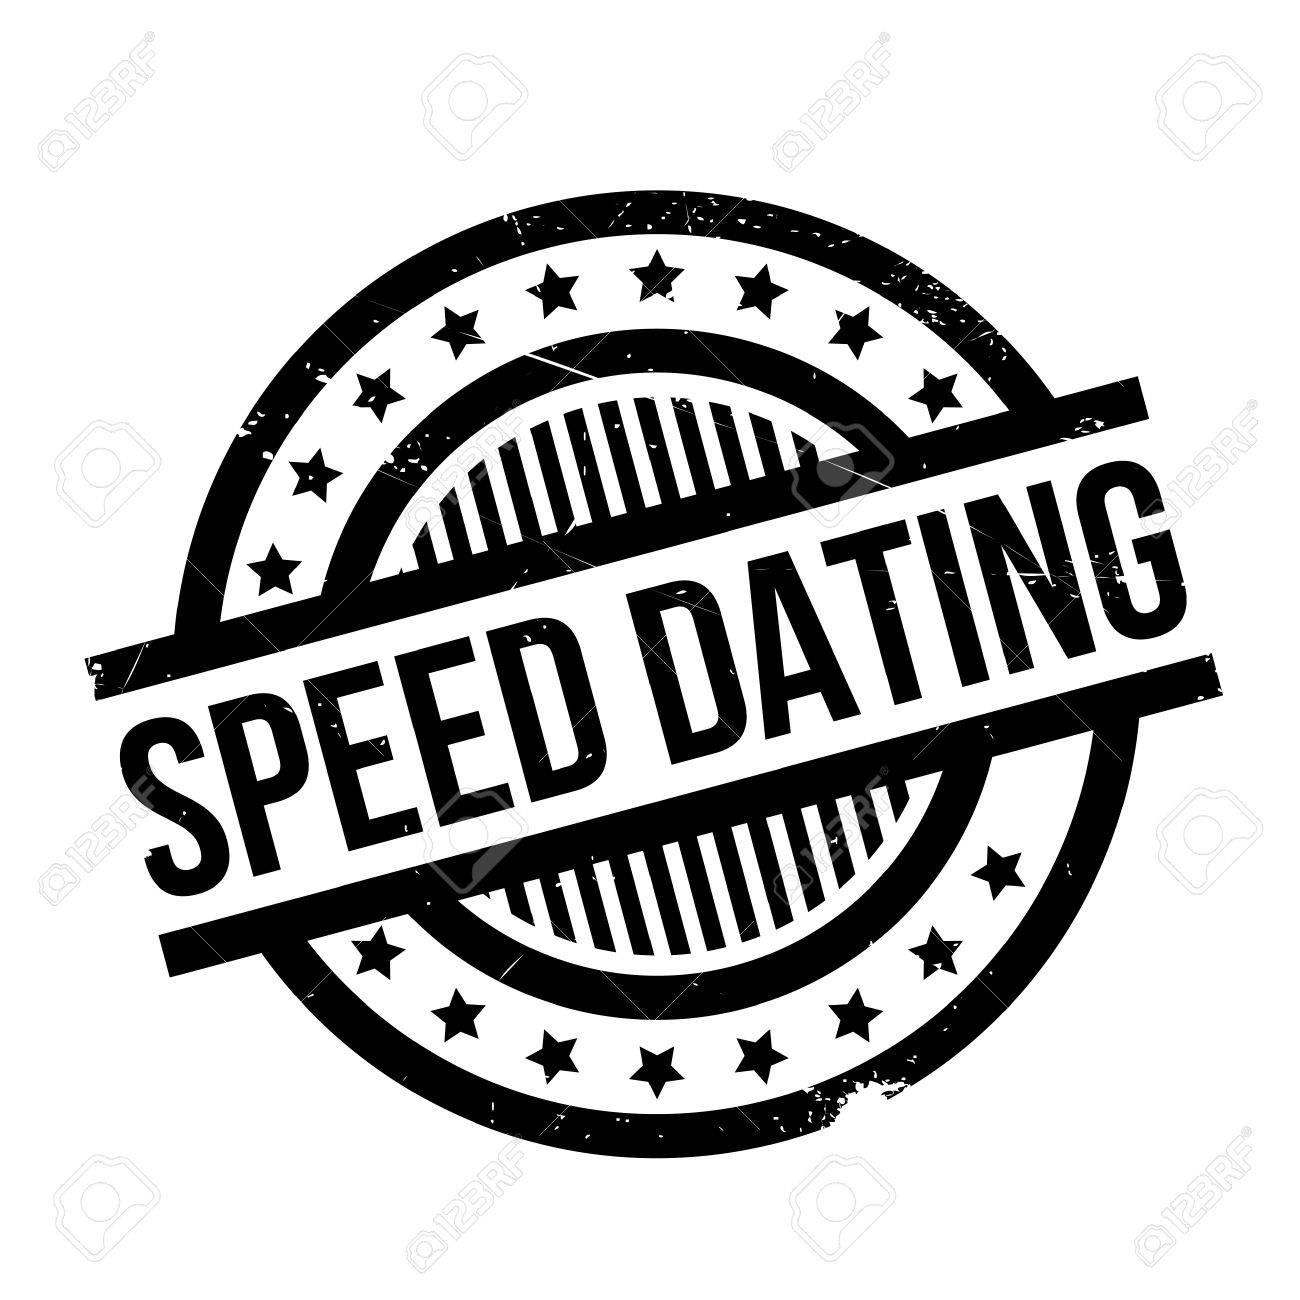 hastighet dating design